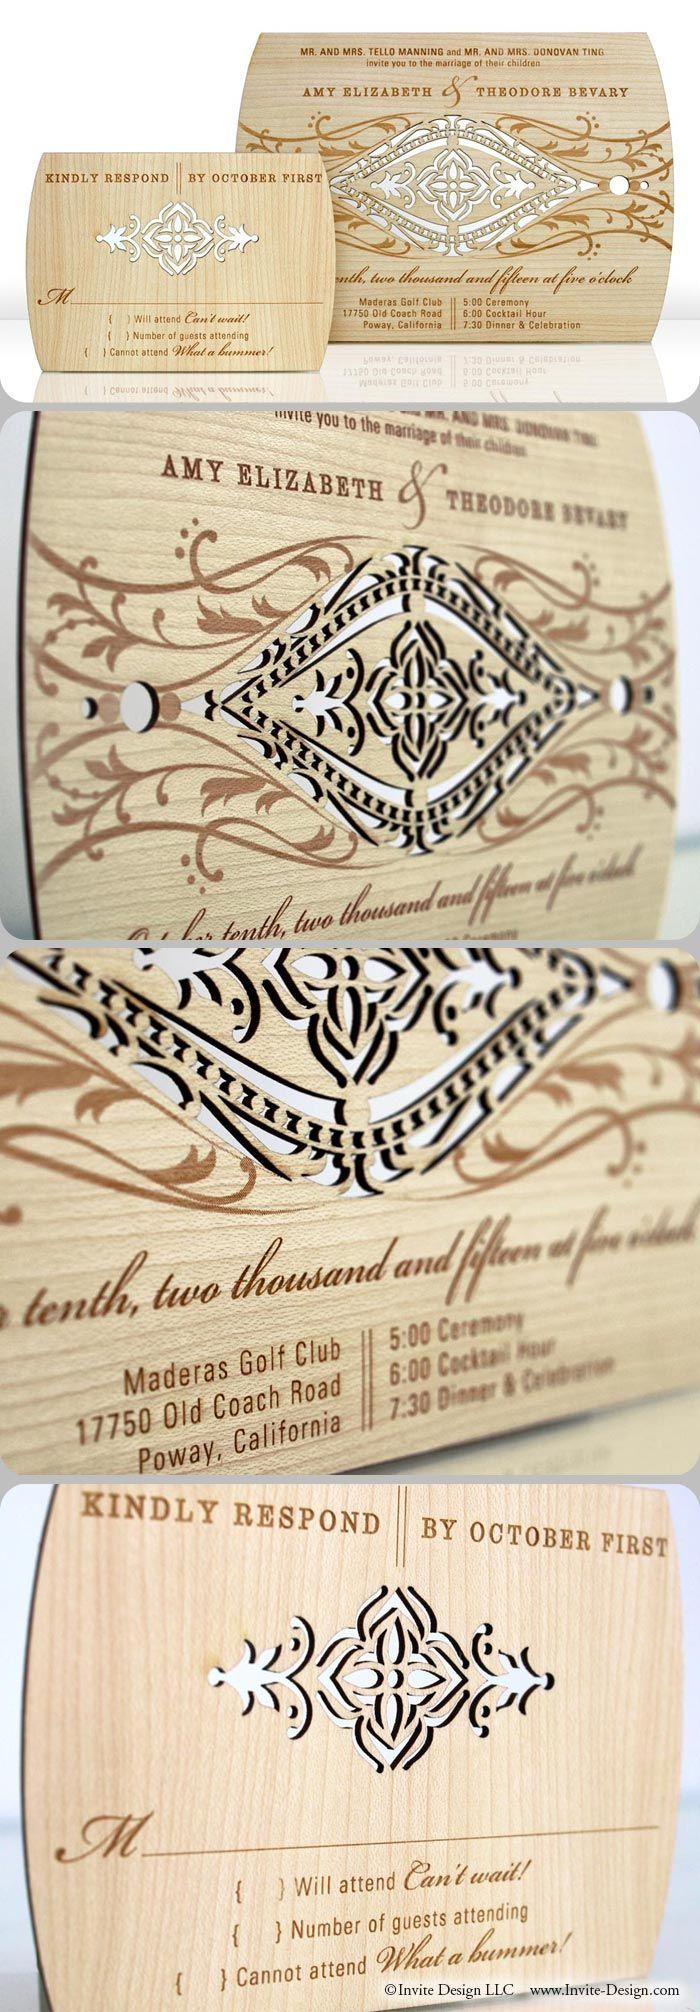 "Ornate wood wedding invitations, intricately laser cut into 1/16"" reclaimed wood panels. http://www.invite-design.com/#!product/prd12/2202403765/lavish-invitation"